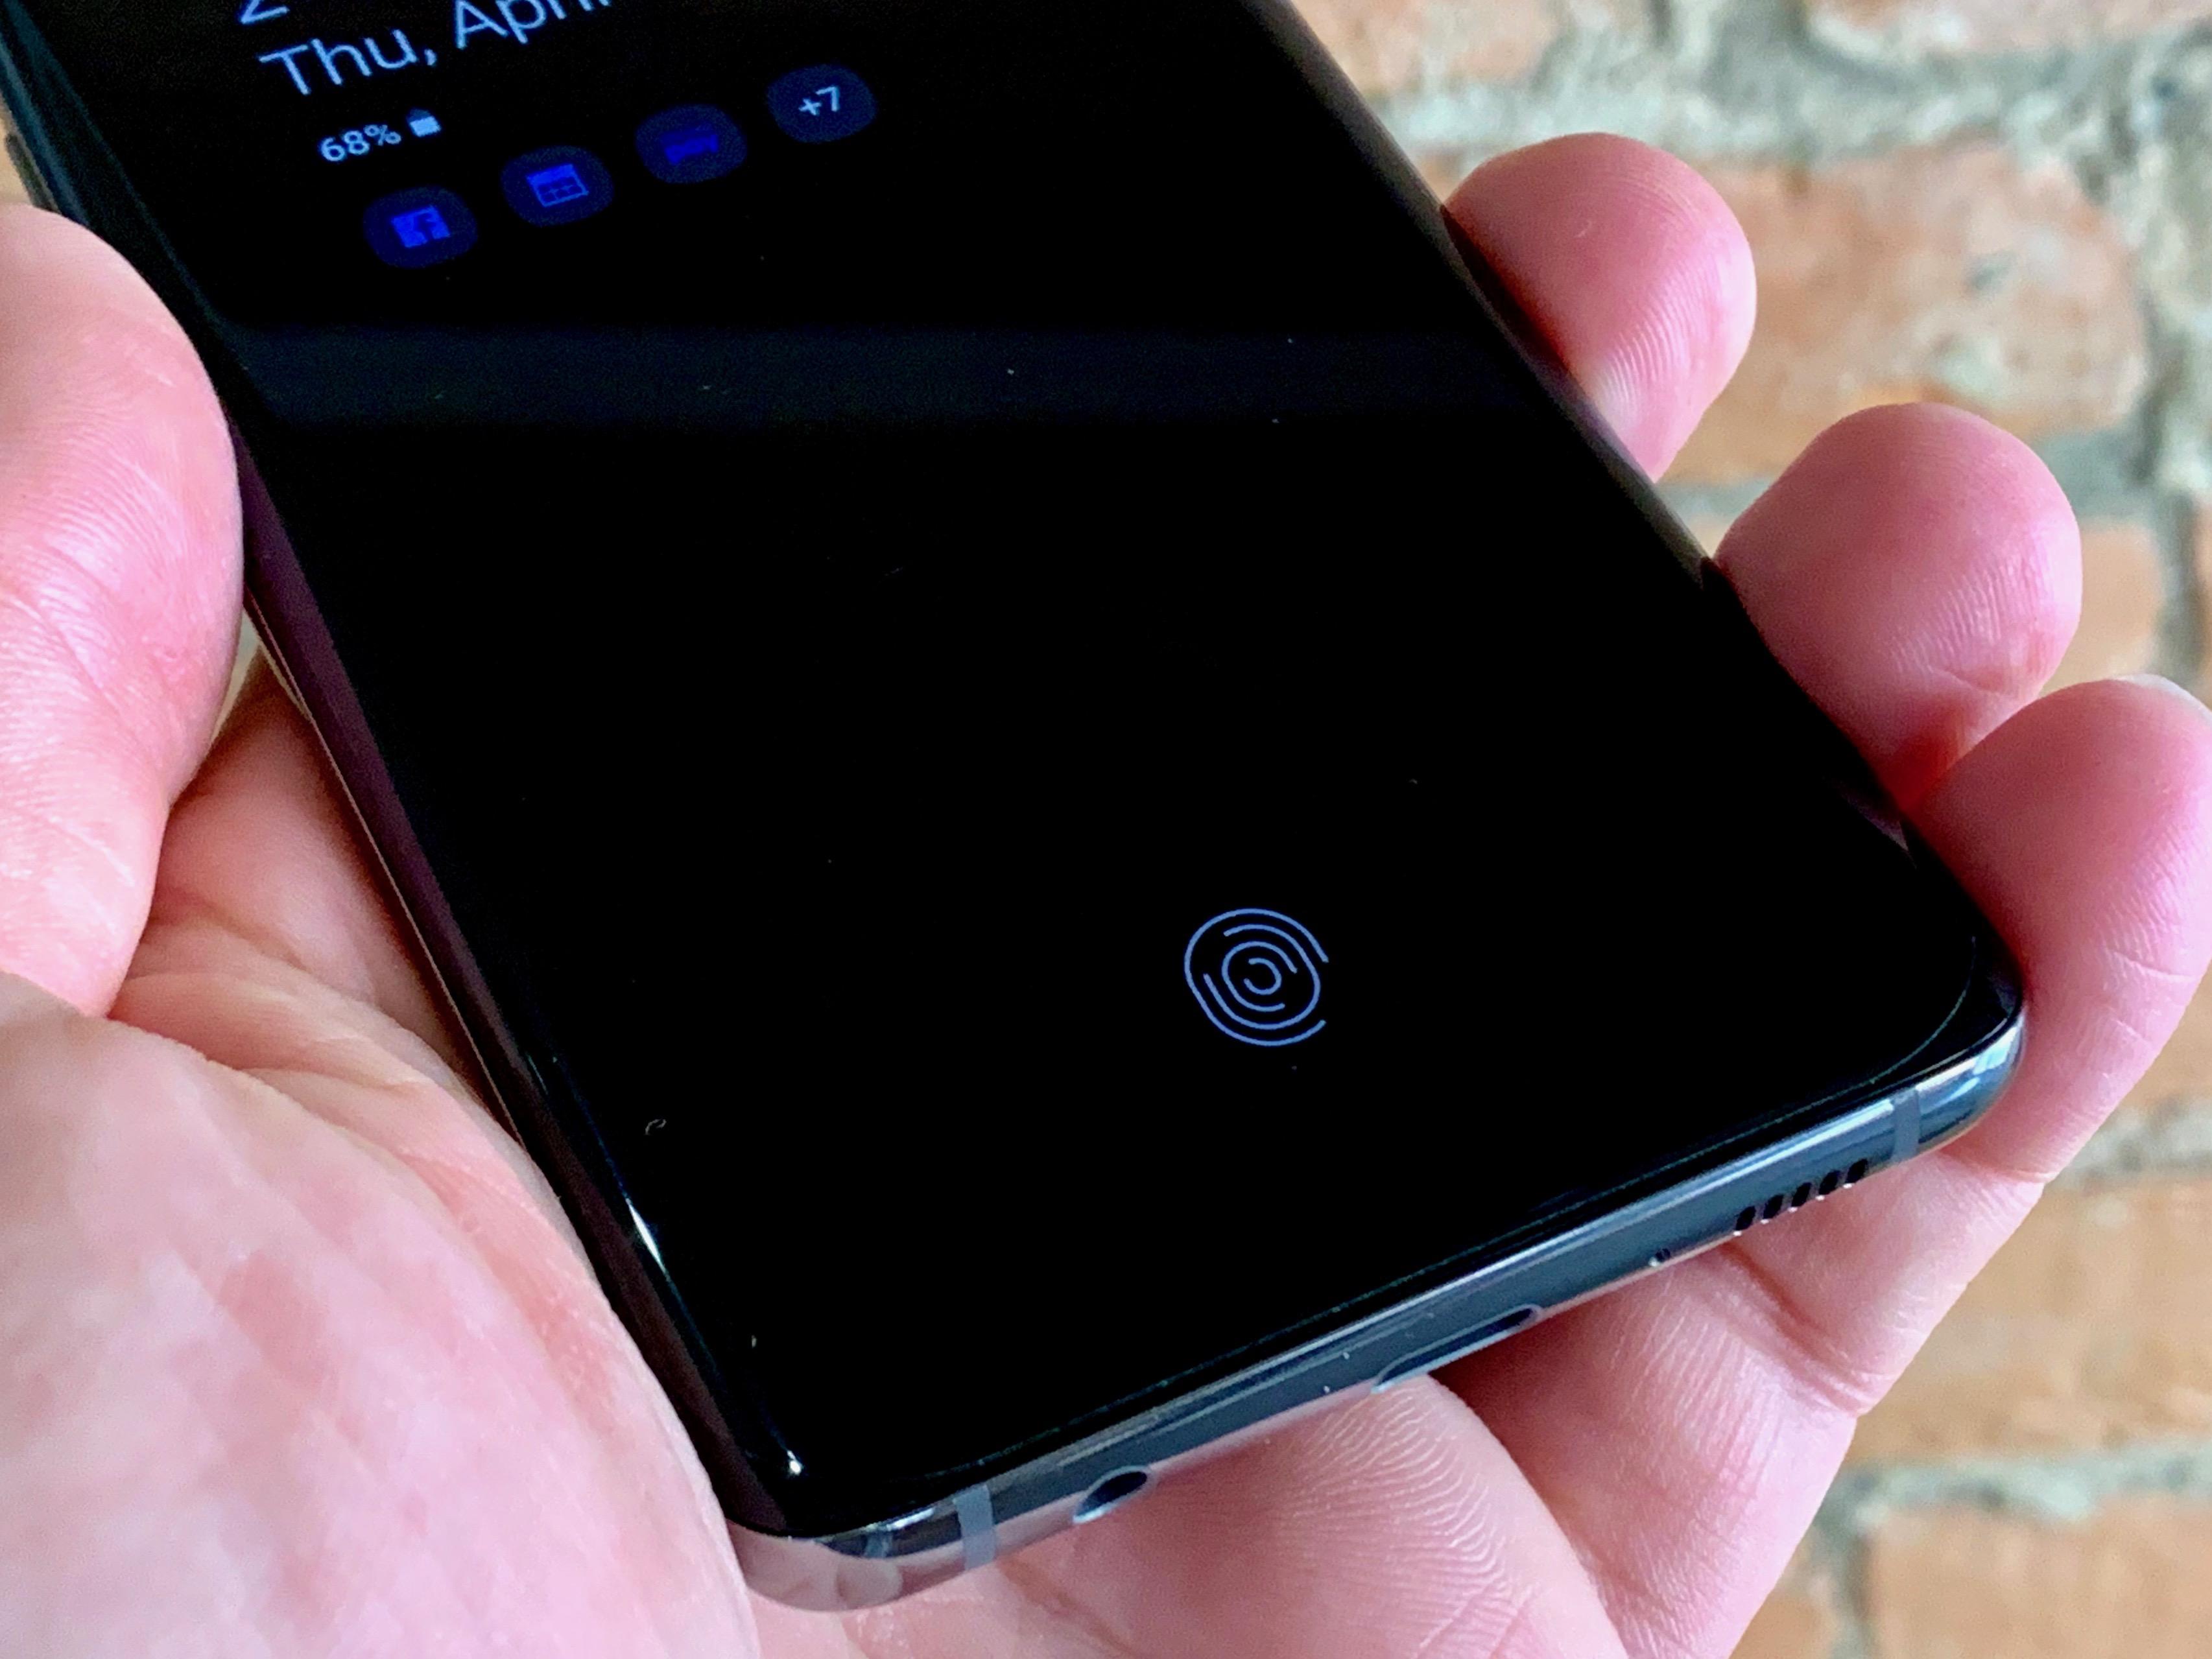 The under screen fingerprint reader is a cool feature.